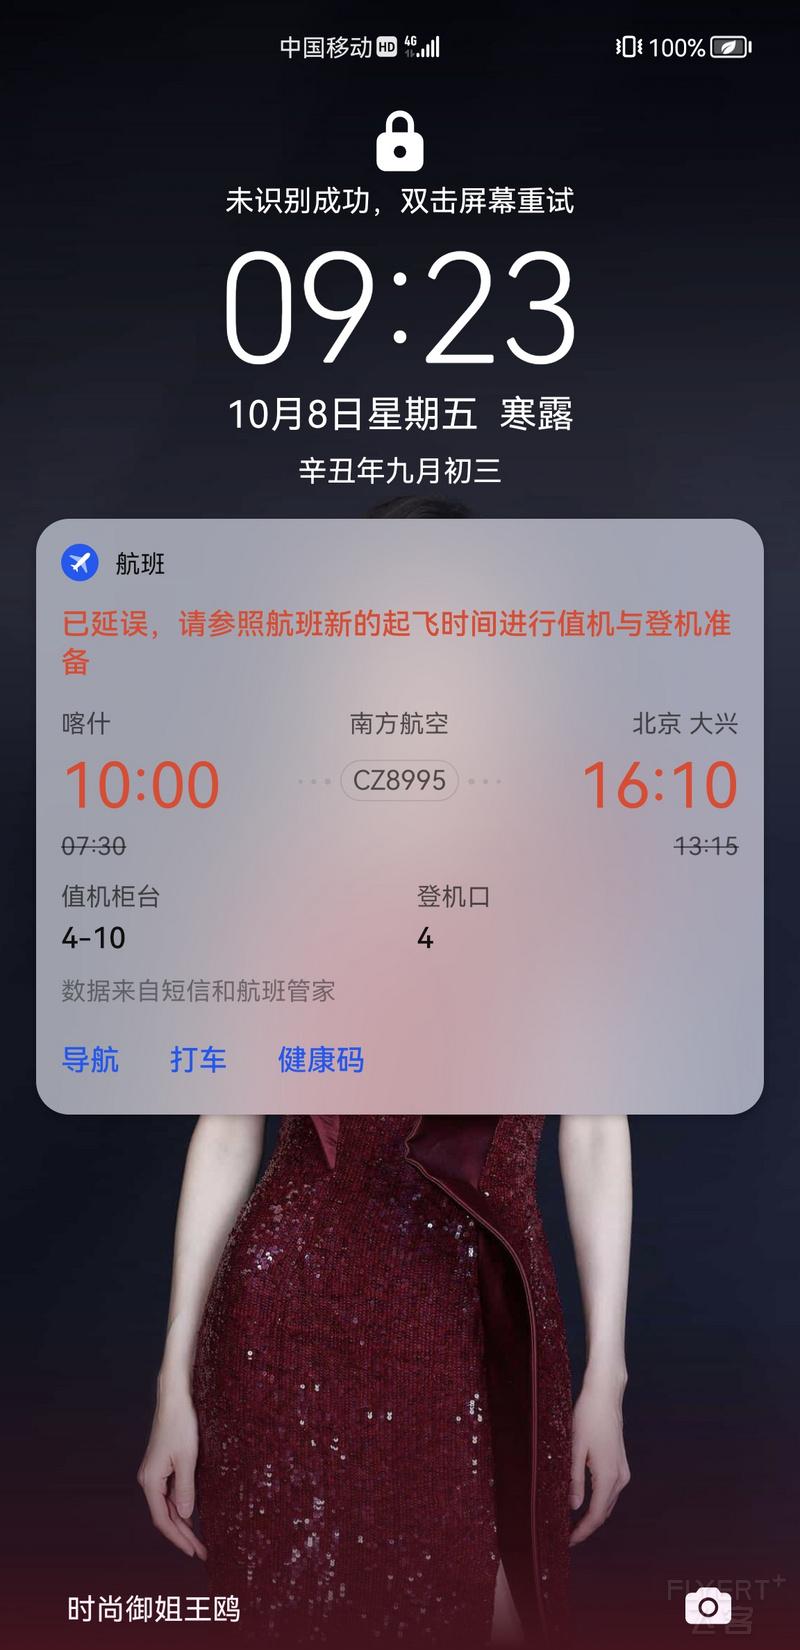 Screenshot_20211008_092310_com.android.keyguard.jpg